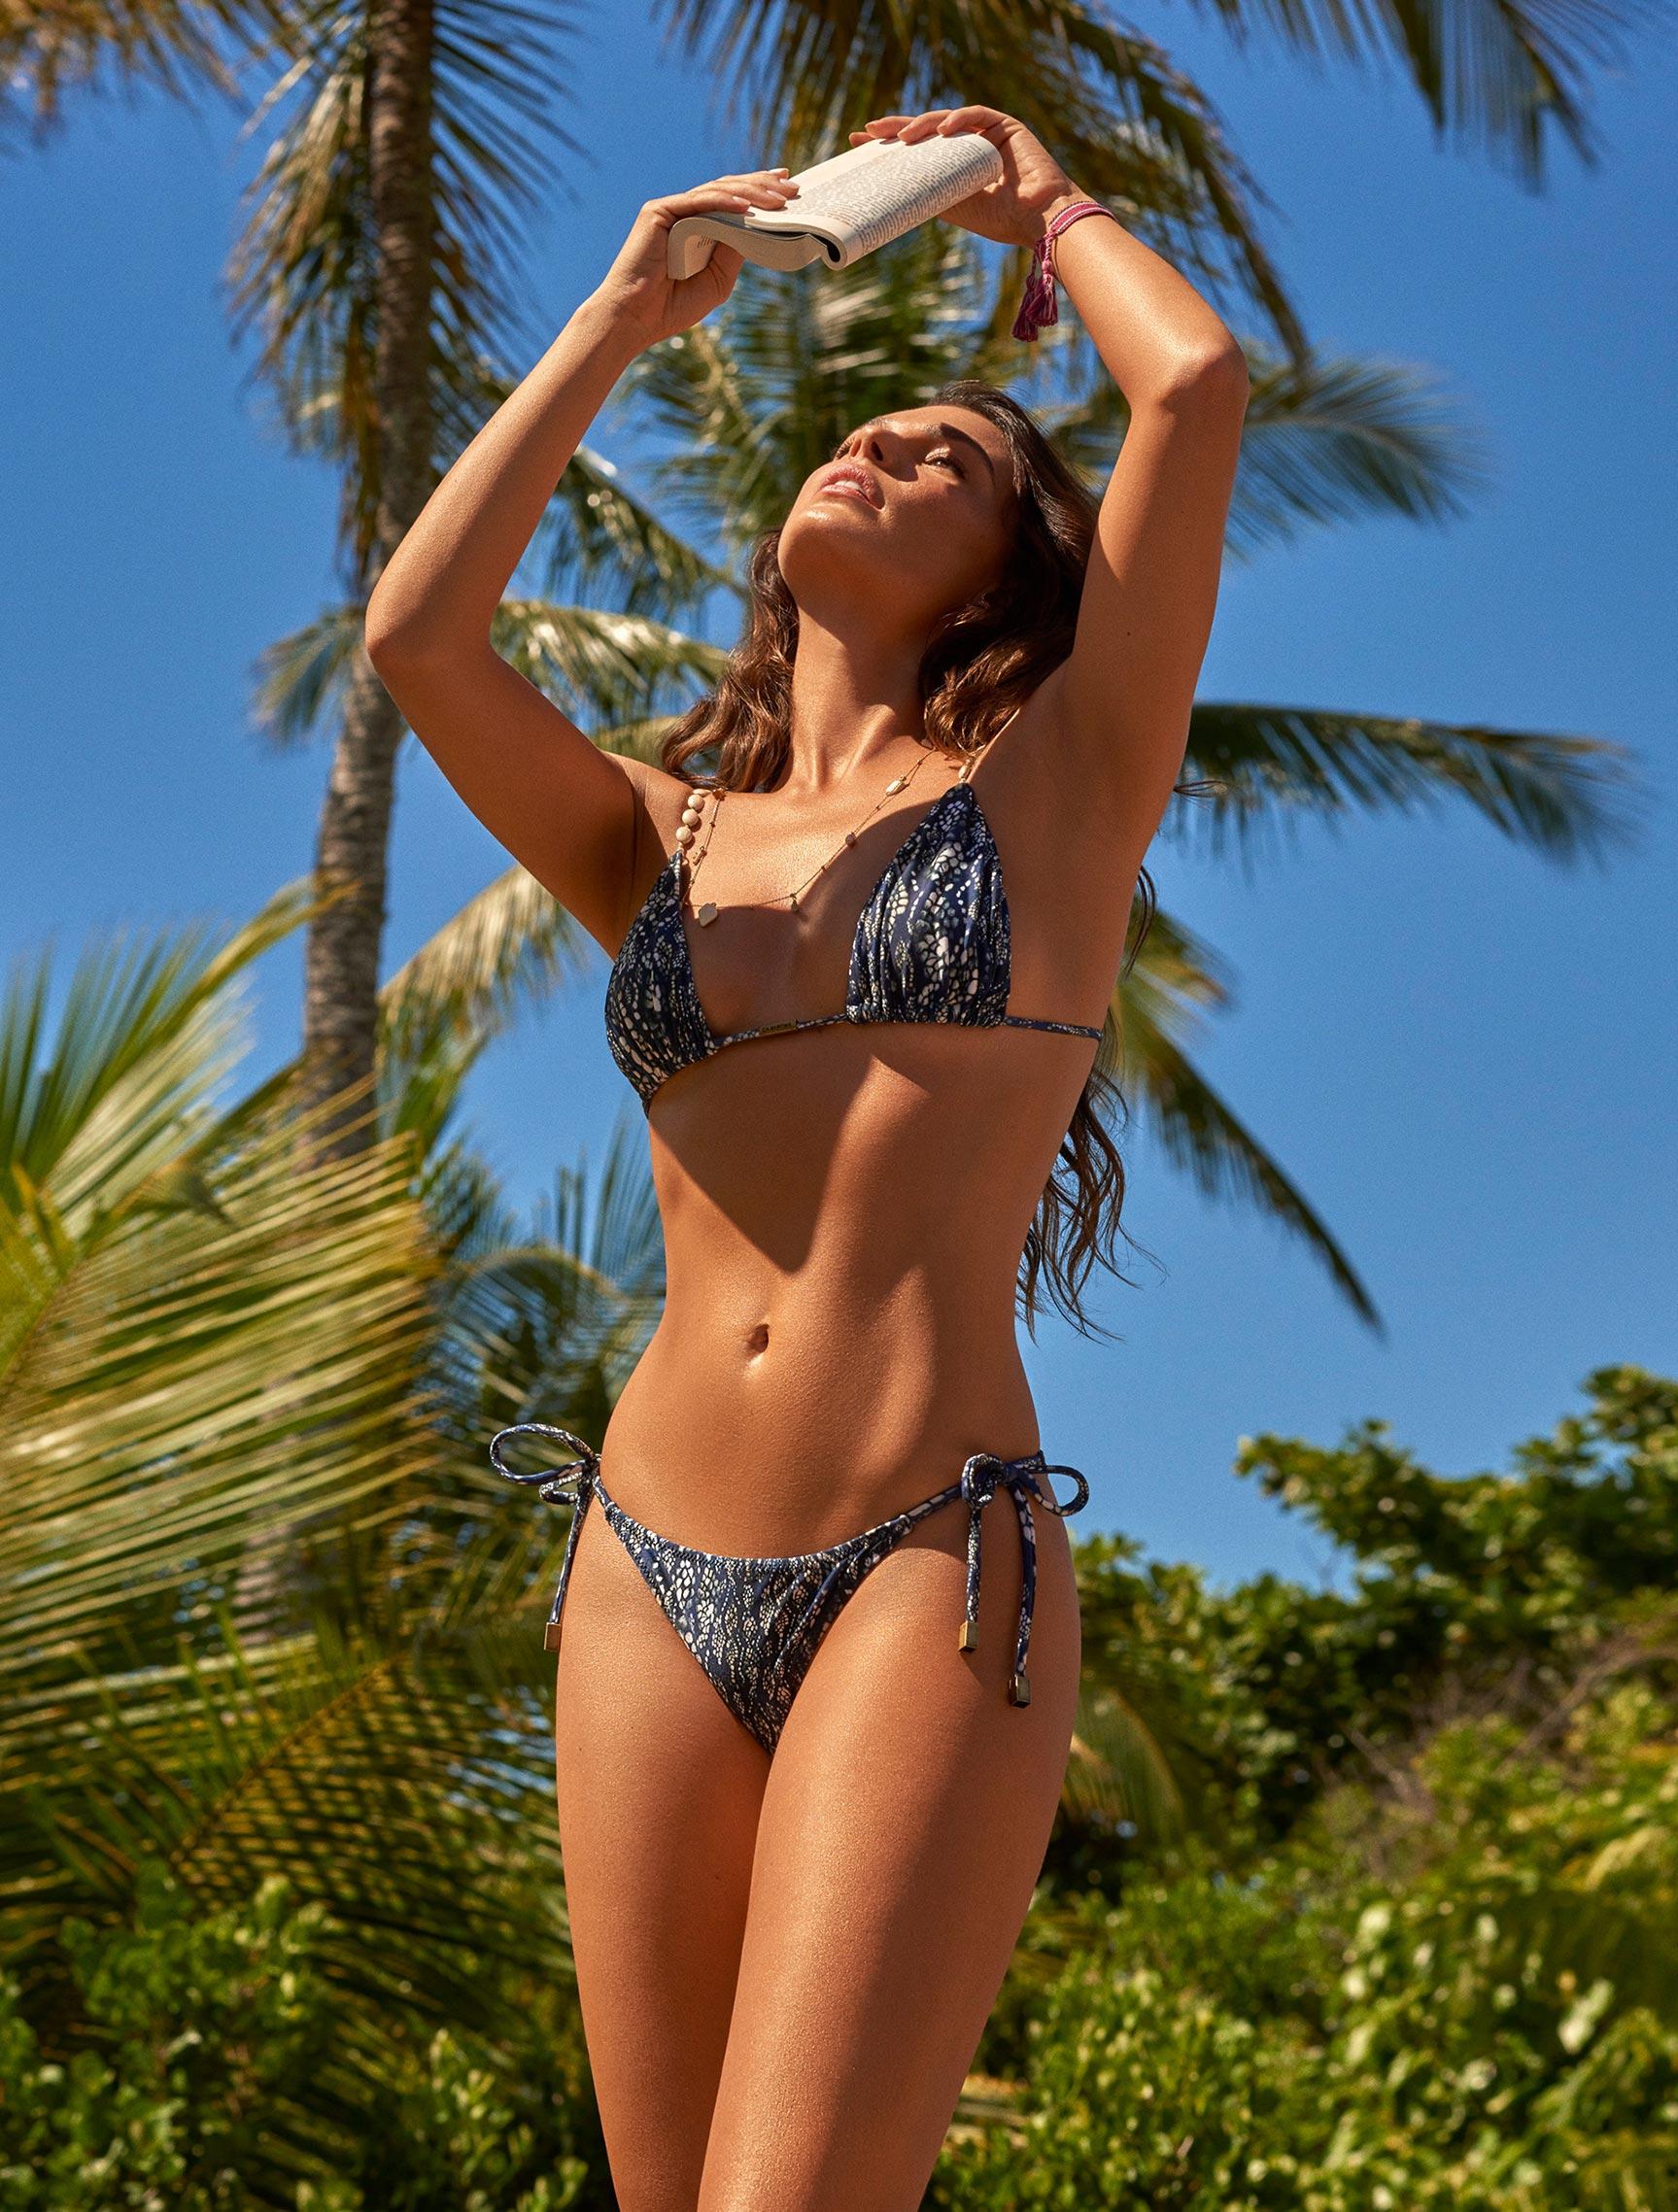 рекламная кампания купальников модного бренда Cia Maritima, сезон весна-лето 2020 / фото 05